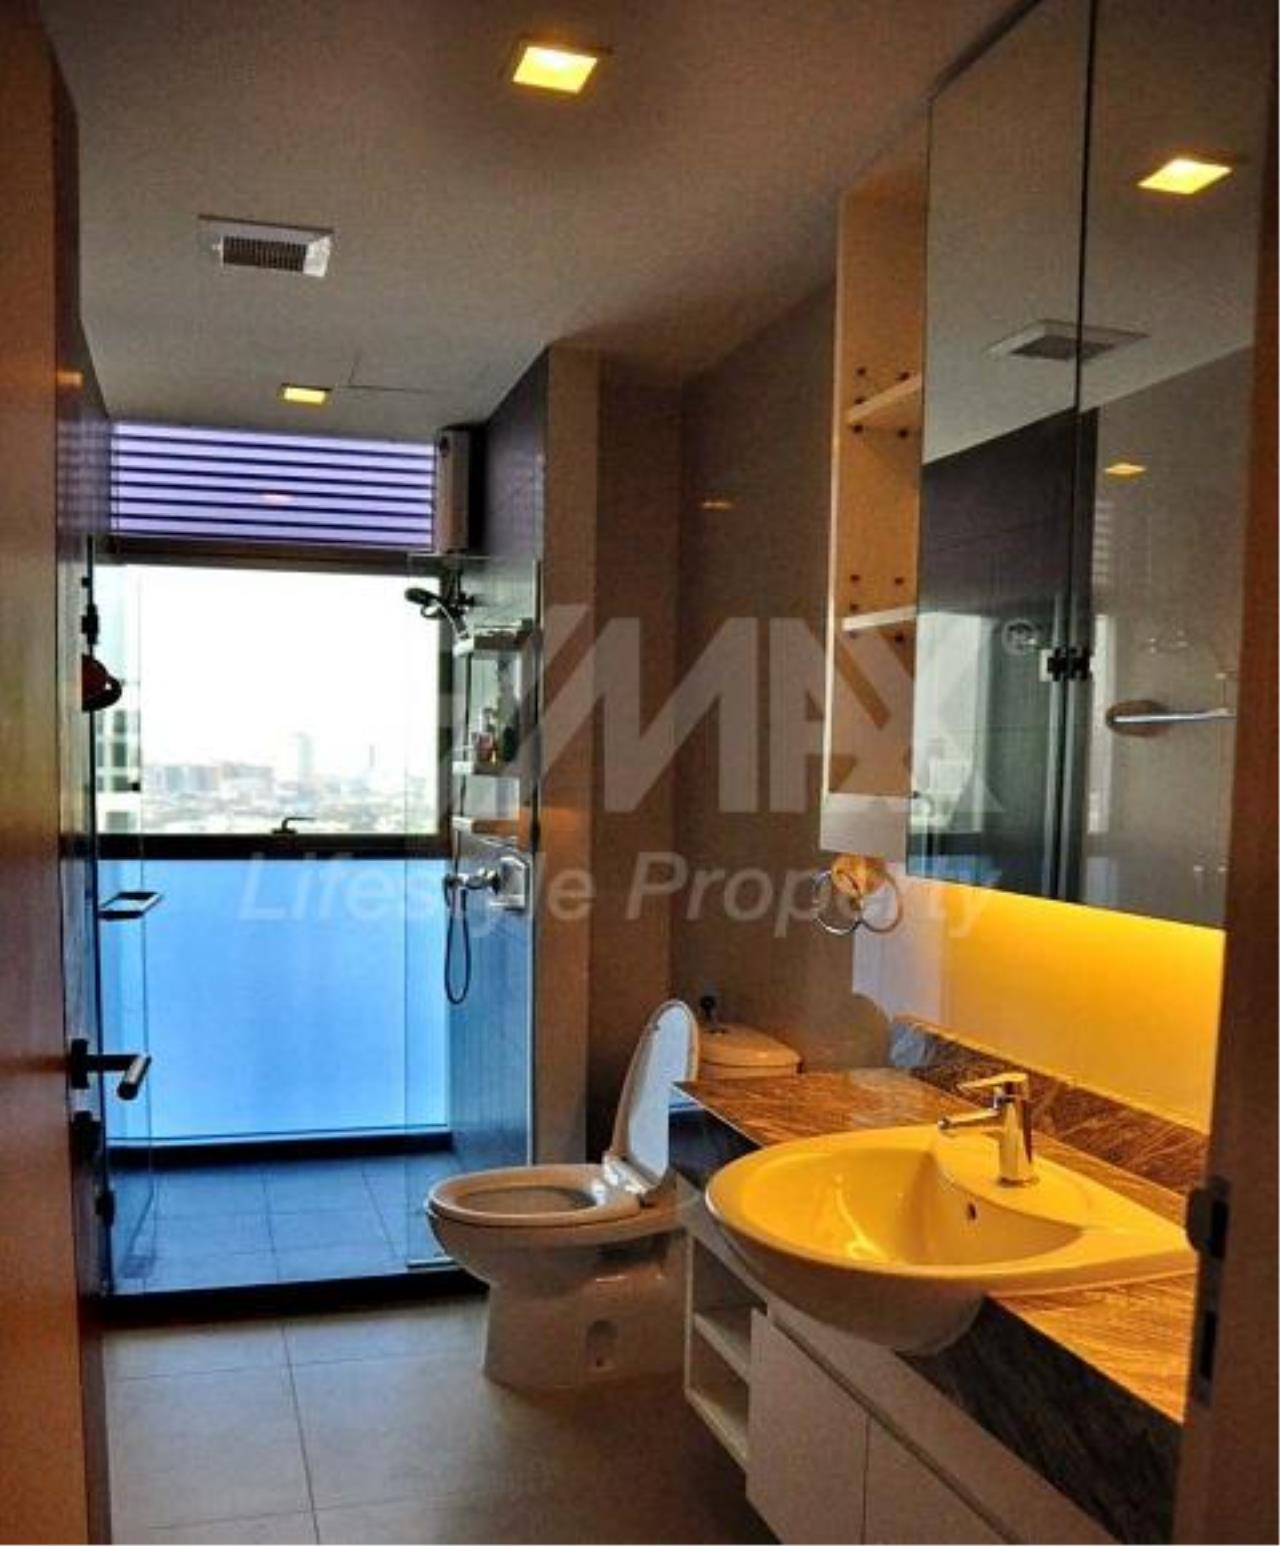 RE/MAX LifeStyle Property Agency's Vertiq 3